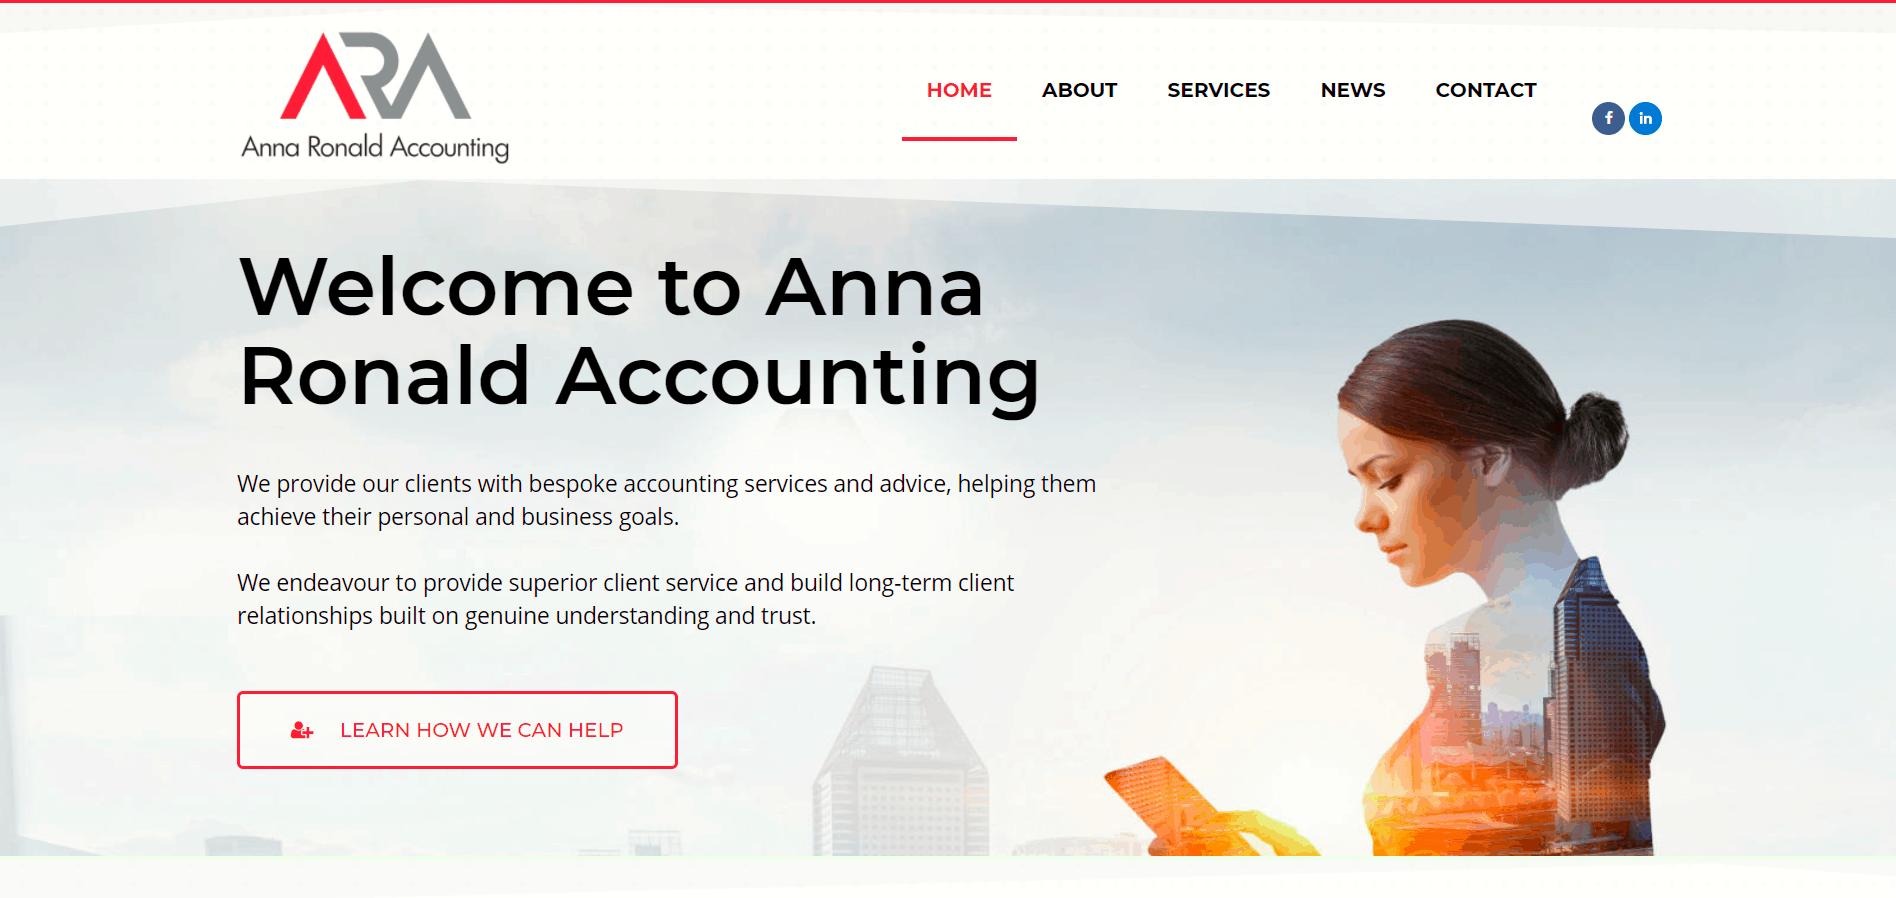 Anna Ronald Accounting